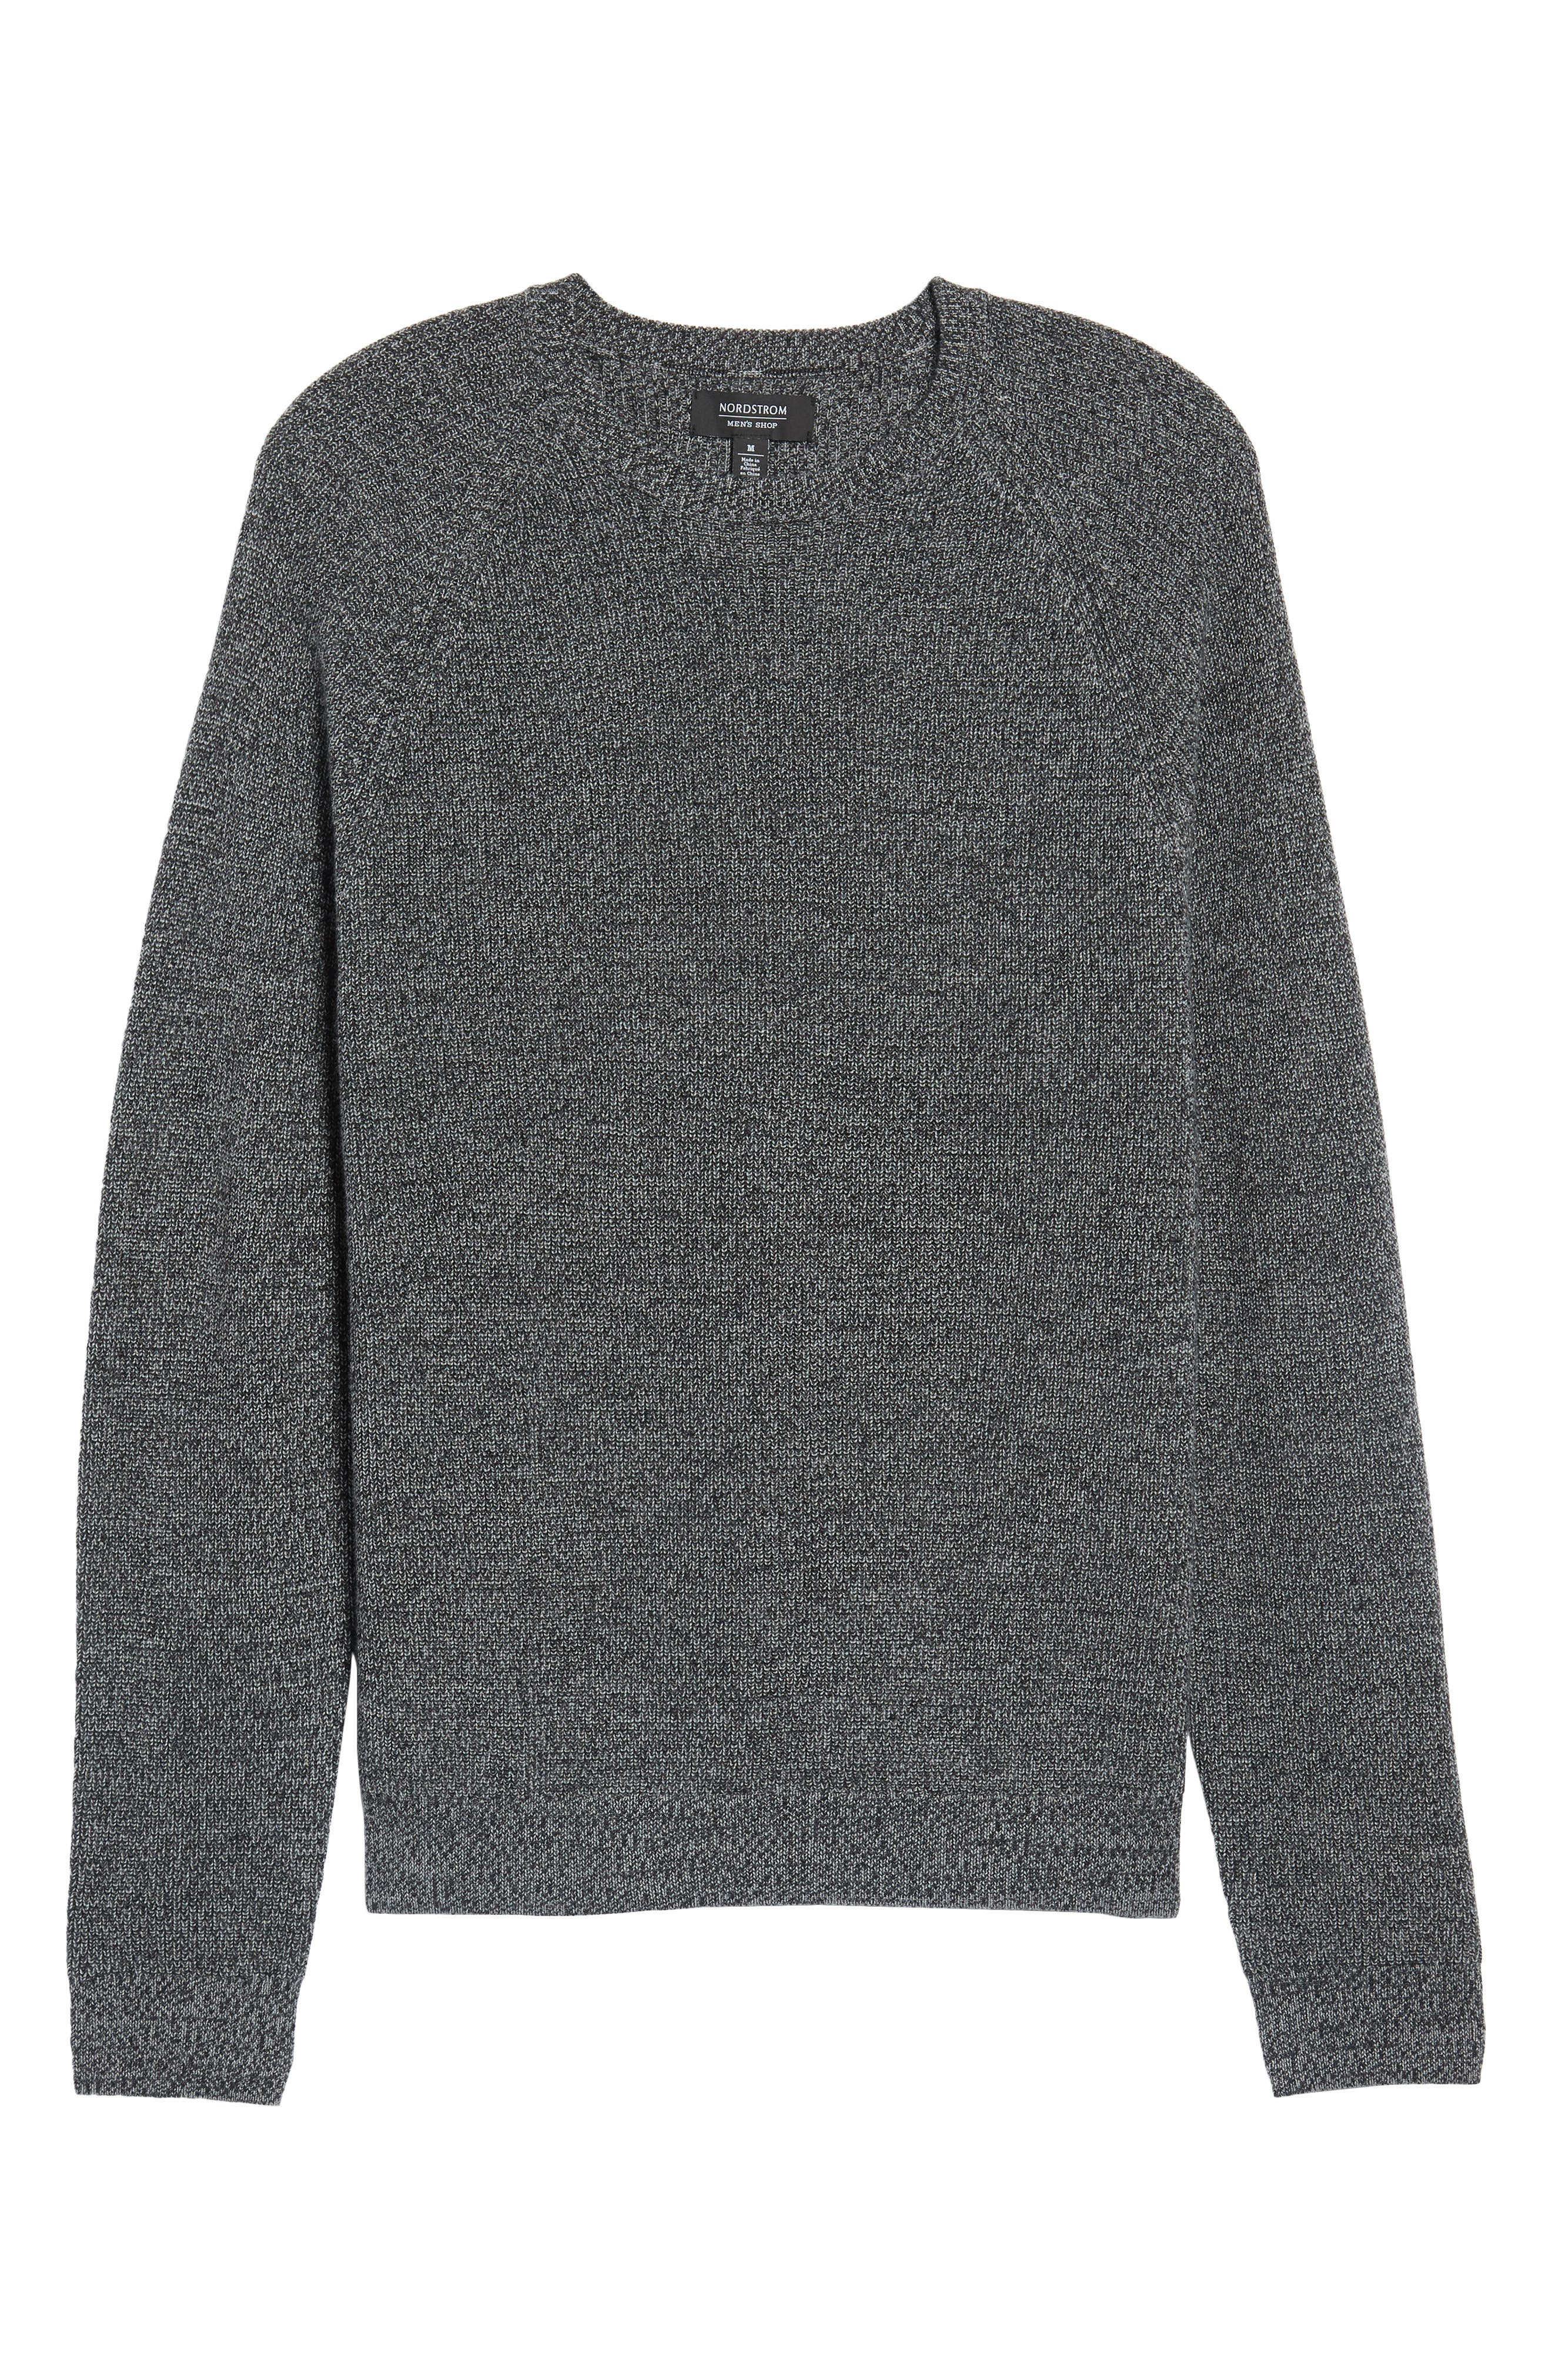 Textured Merino Wool Blend Sweater,                             Main thumbnail 1, color,                             Black Caviar Melange